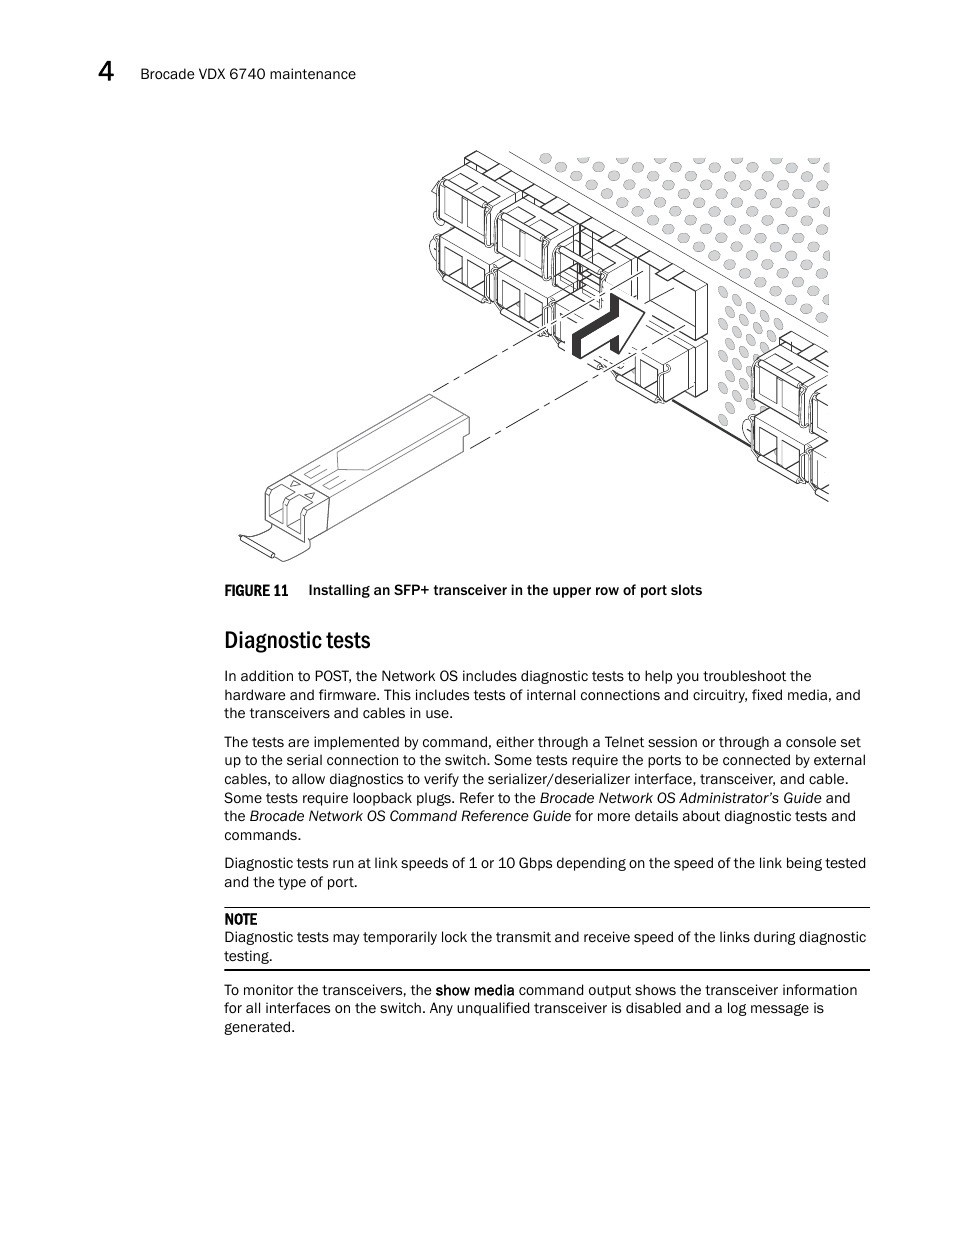 Diagnostic tests | Brocade VDX 6740 Hardware Reference Manual